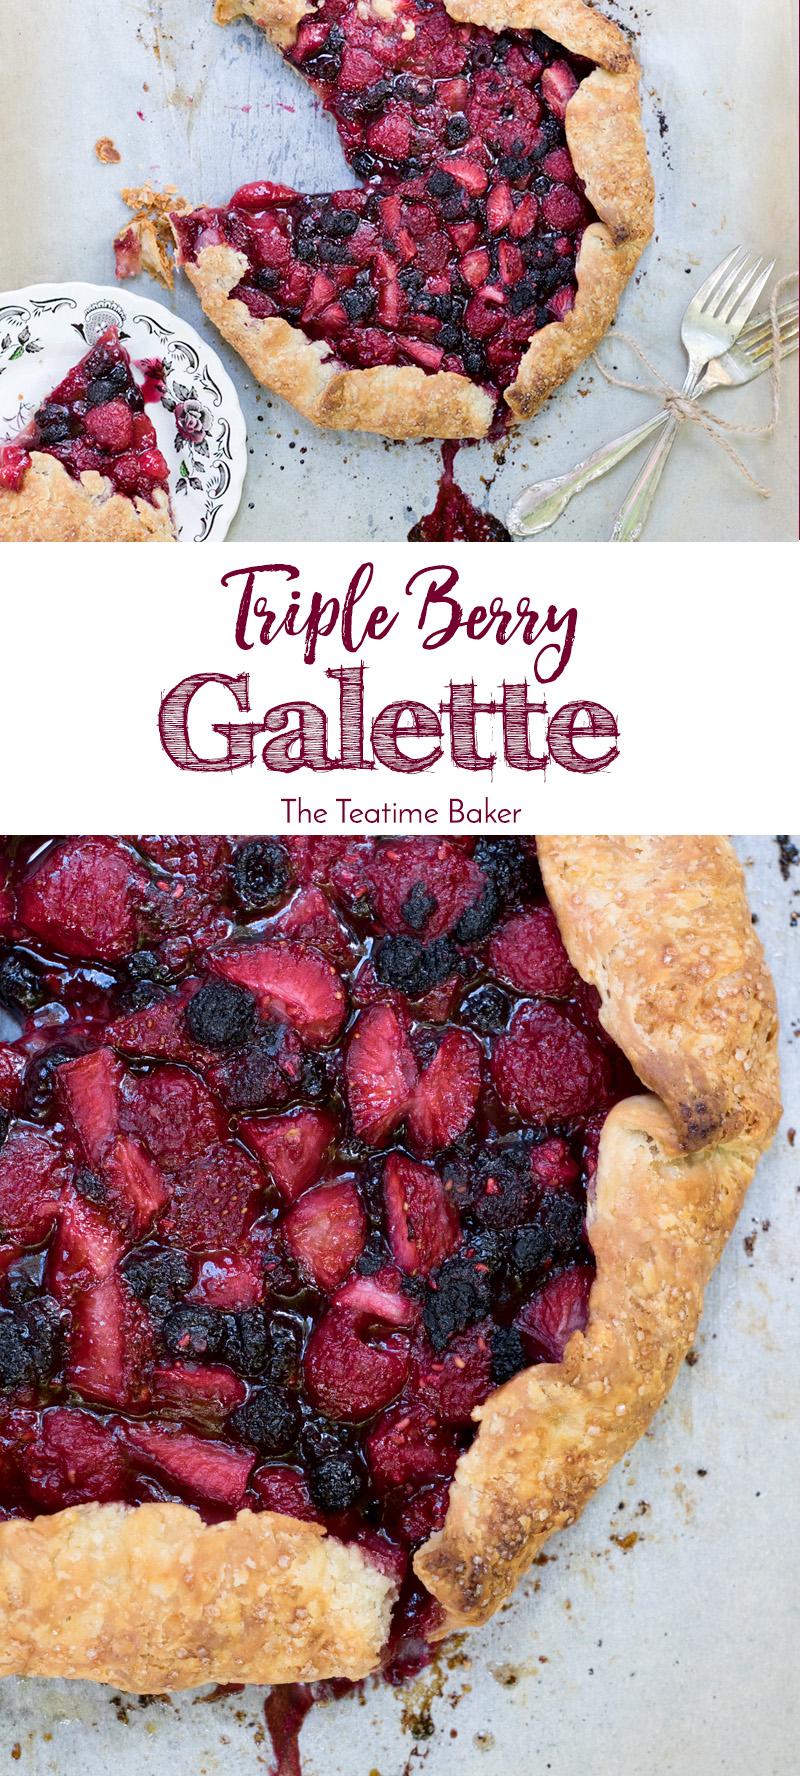 Summer Dessert | Triple Berry Galette | Pie Recipe | Summer Berry Dessert